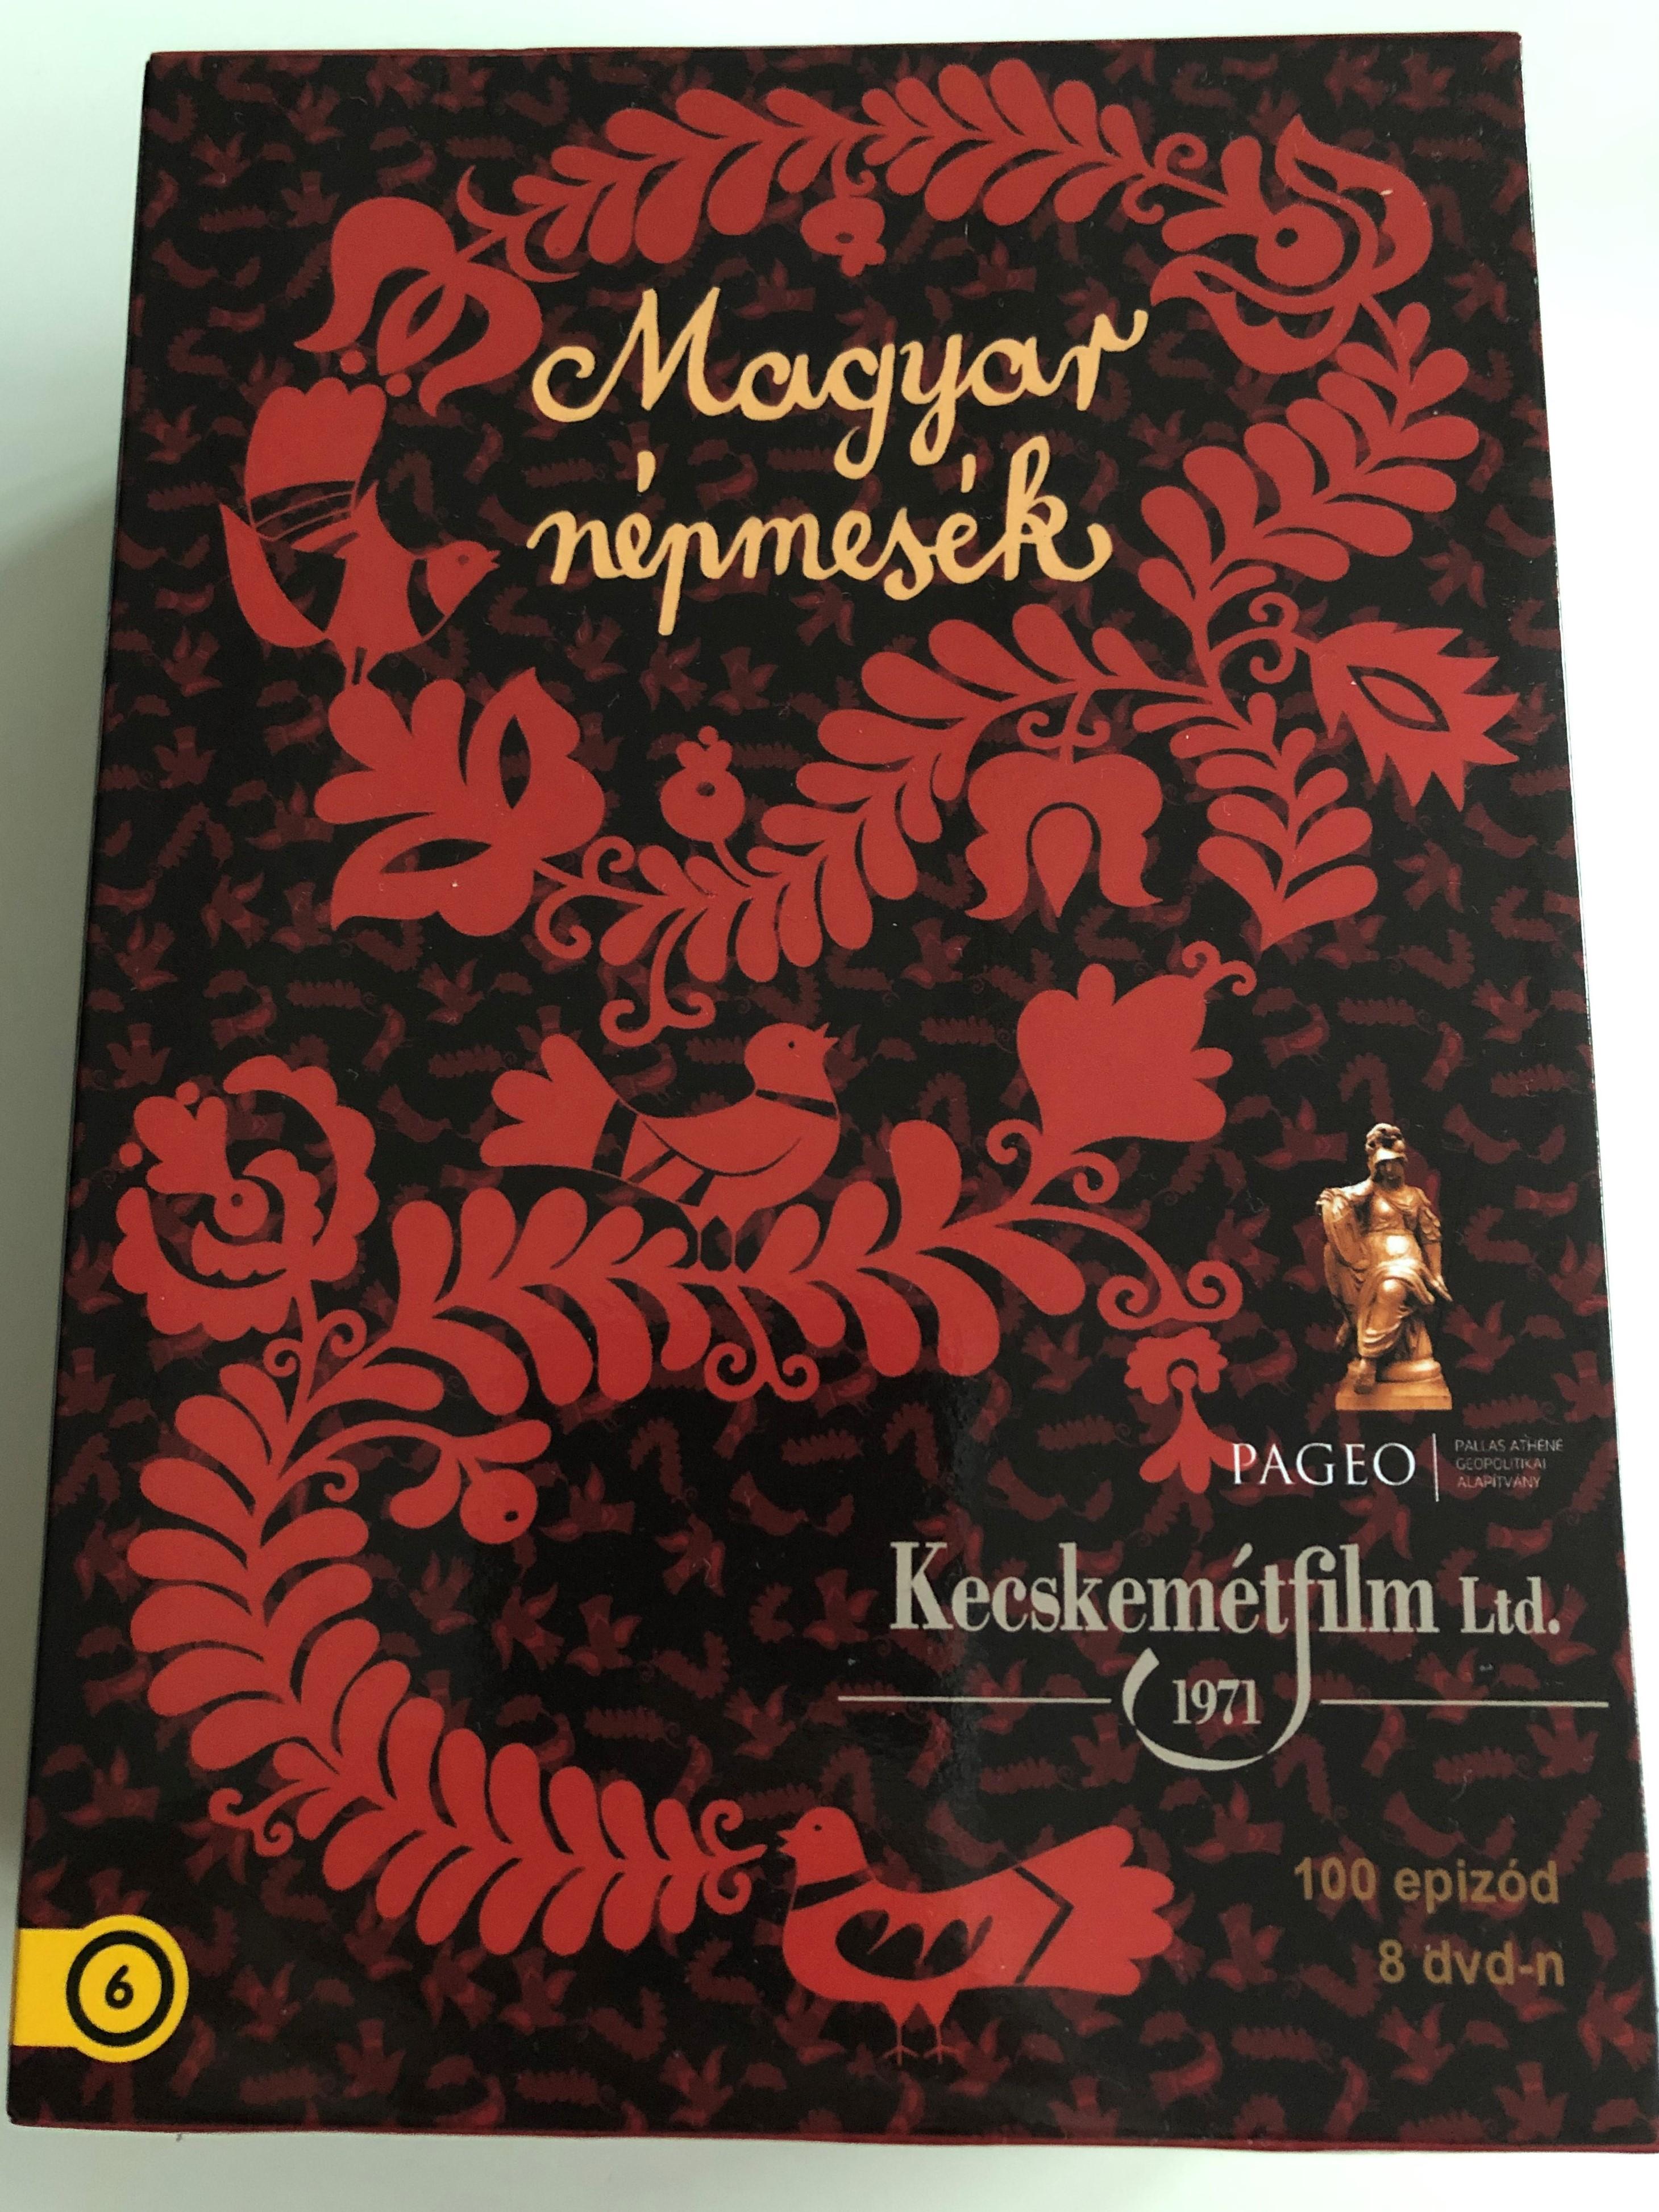 magyar-n-pmes-k-dvd-box-hungarian-folk-tales-set-100-episodes-on-8-dvds-100-epiz-d-8-dvd-n-kecskem-tfilm-directed-by-jankovics-marcell-horv-th-m-ria-nagy-lajos-1-.jpg